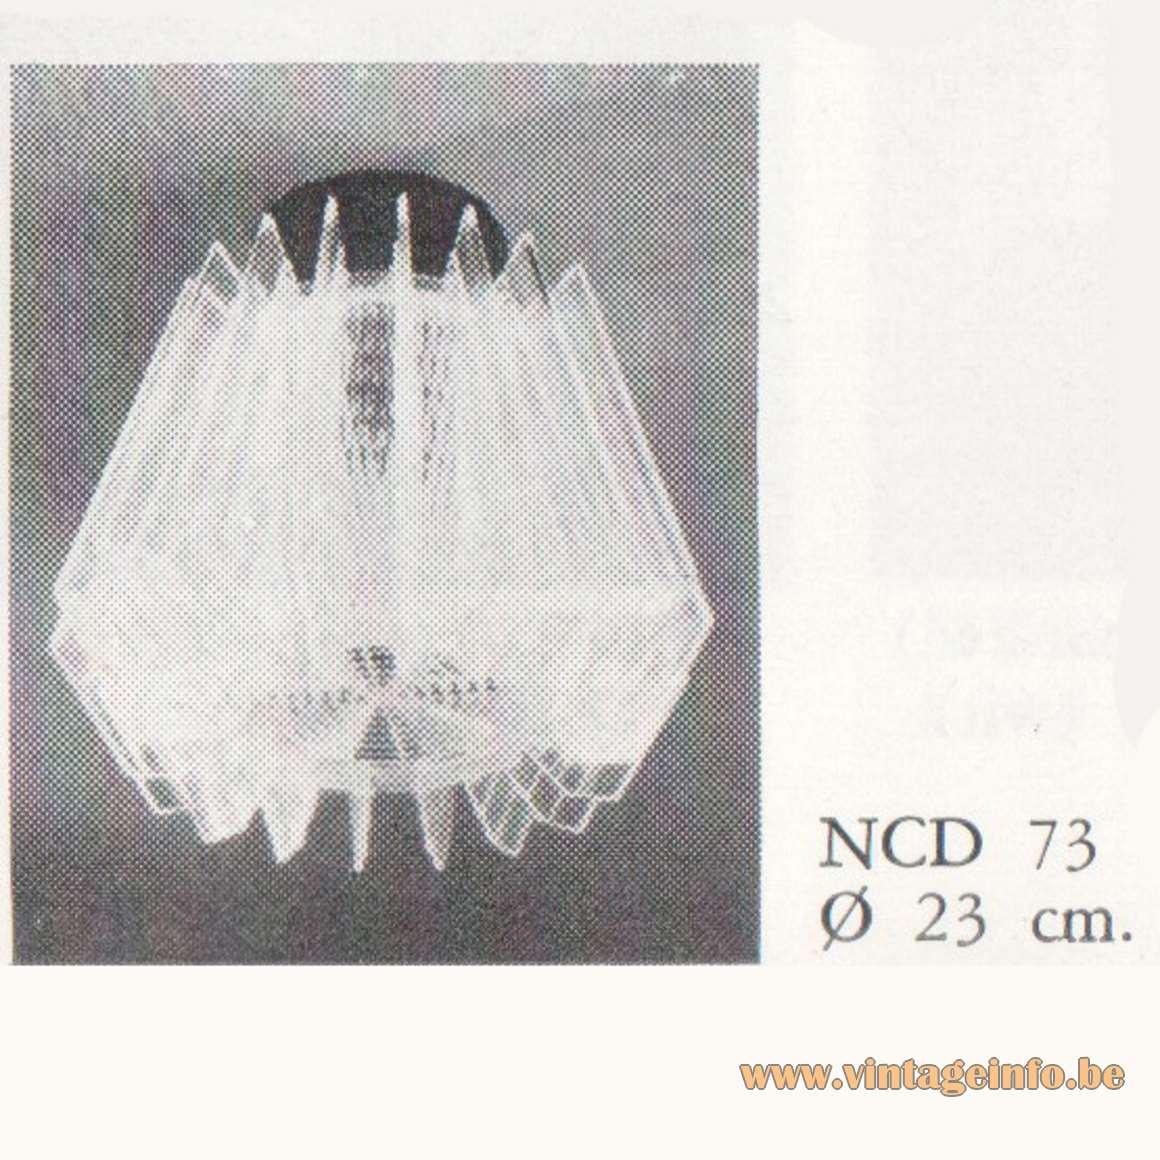 1967 Philips Slats Ceiling Lamp NCD 73